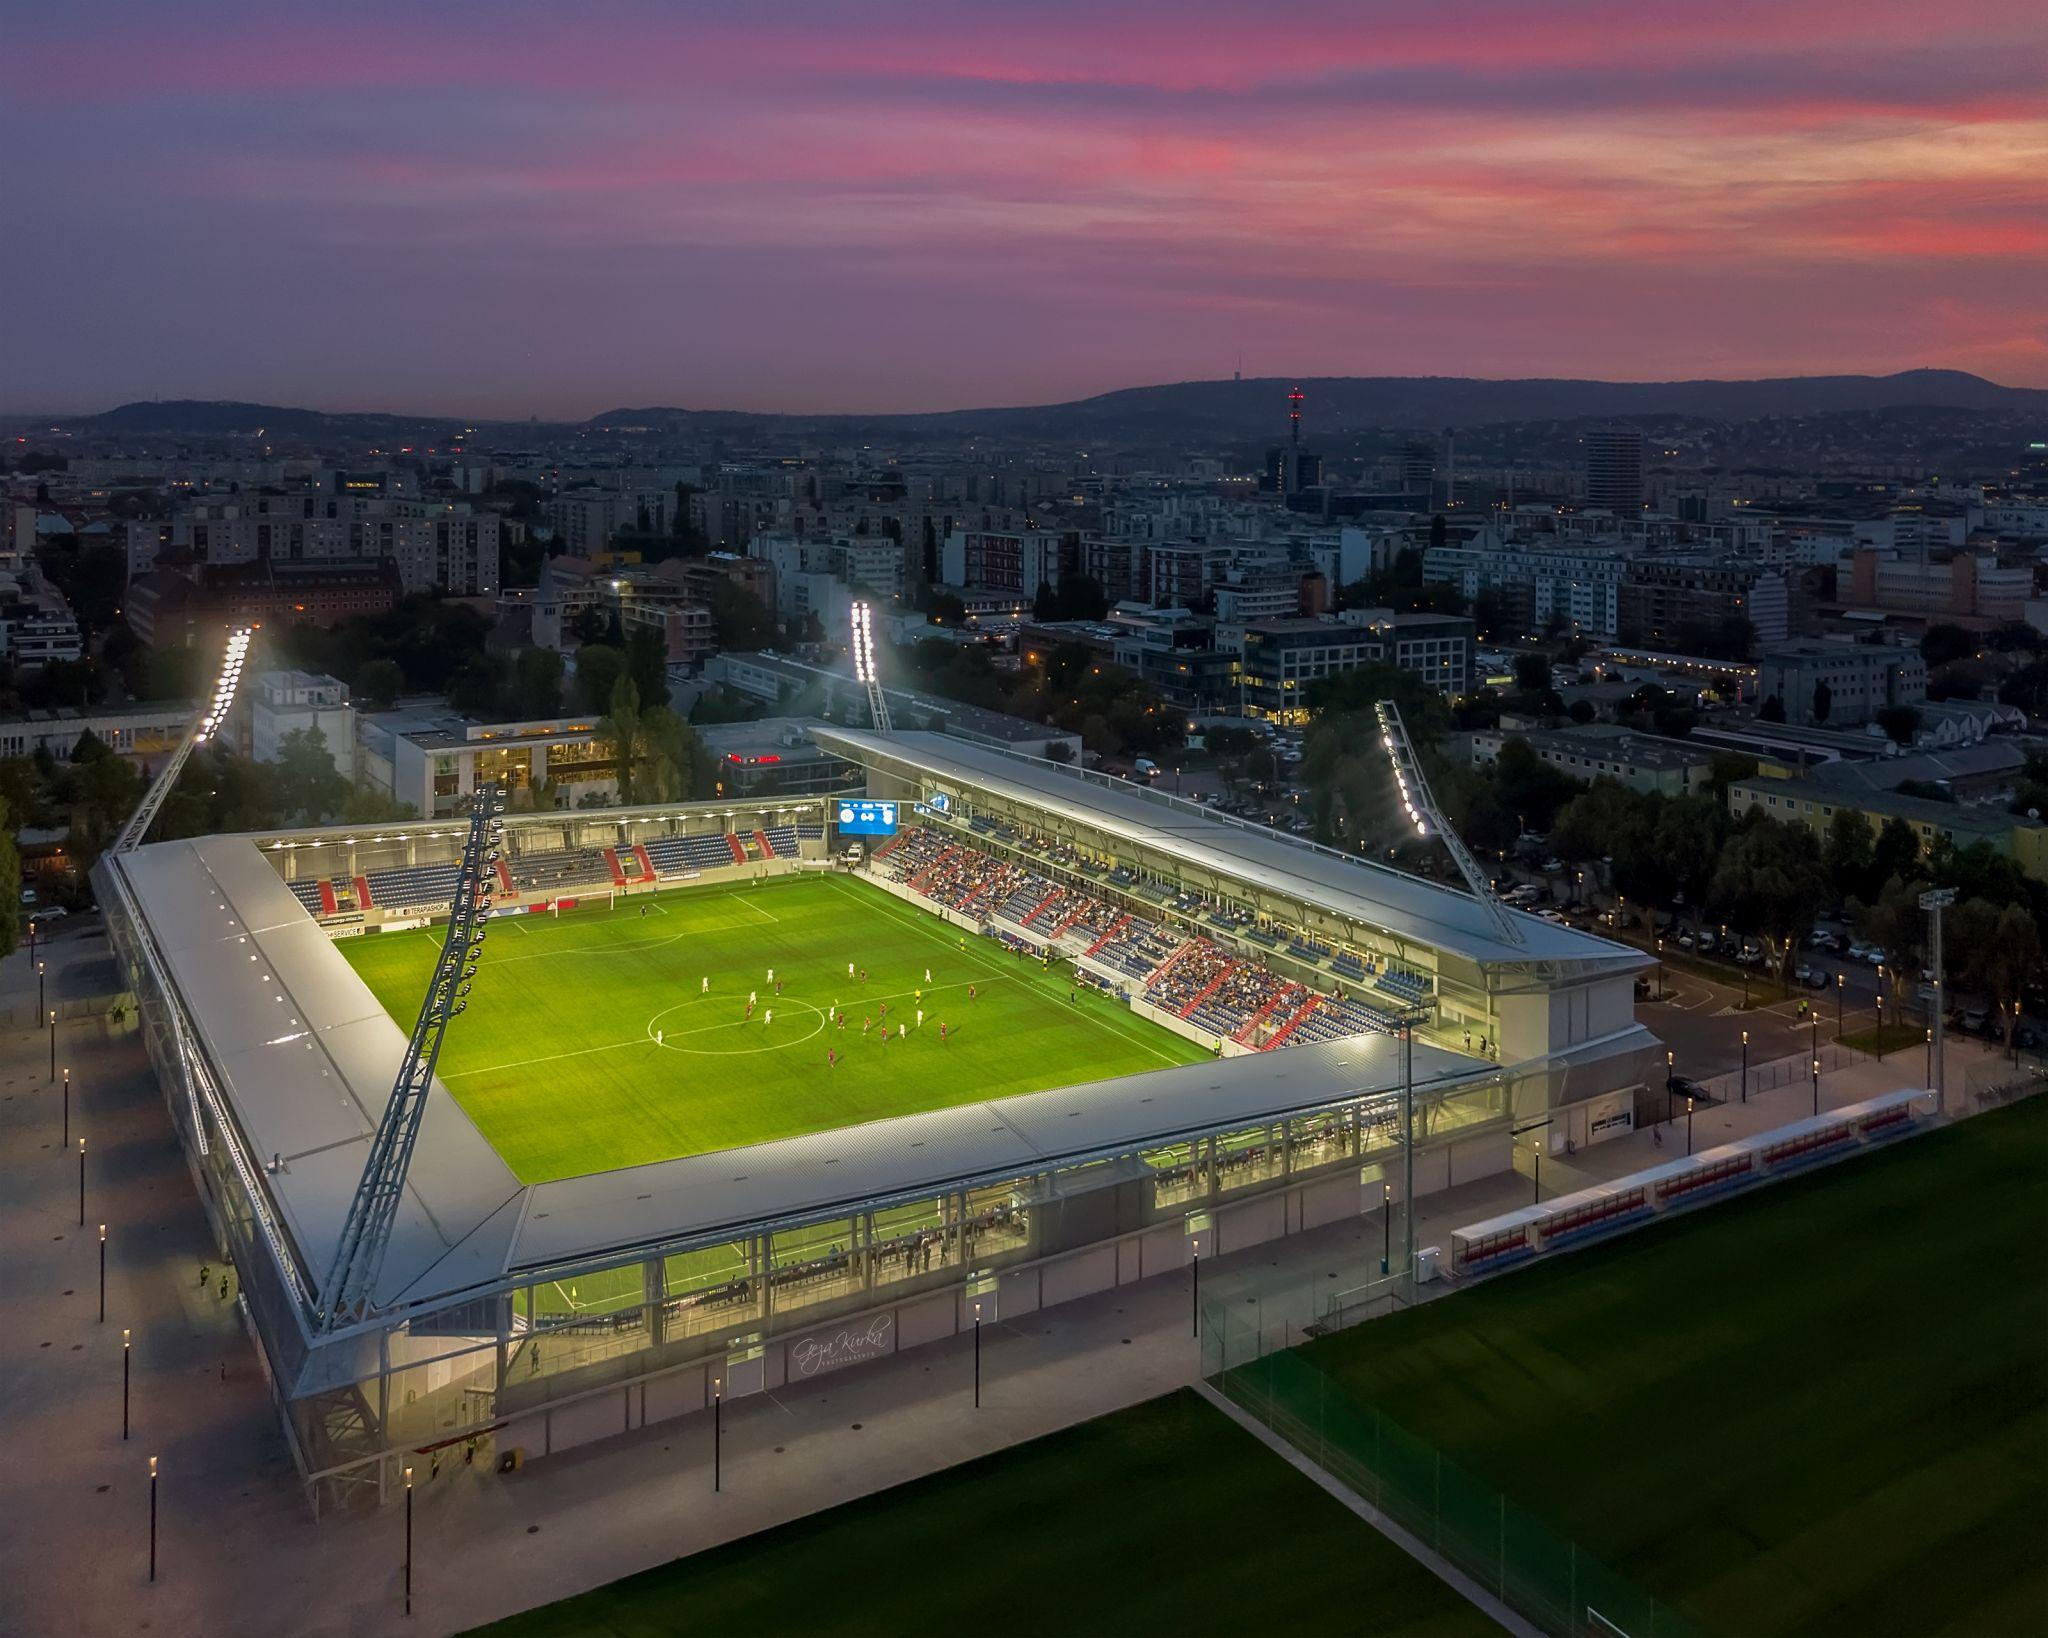 Vasas SC stadium, Hungary